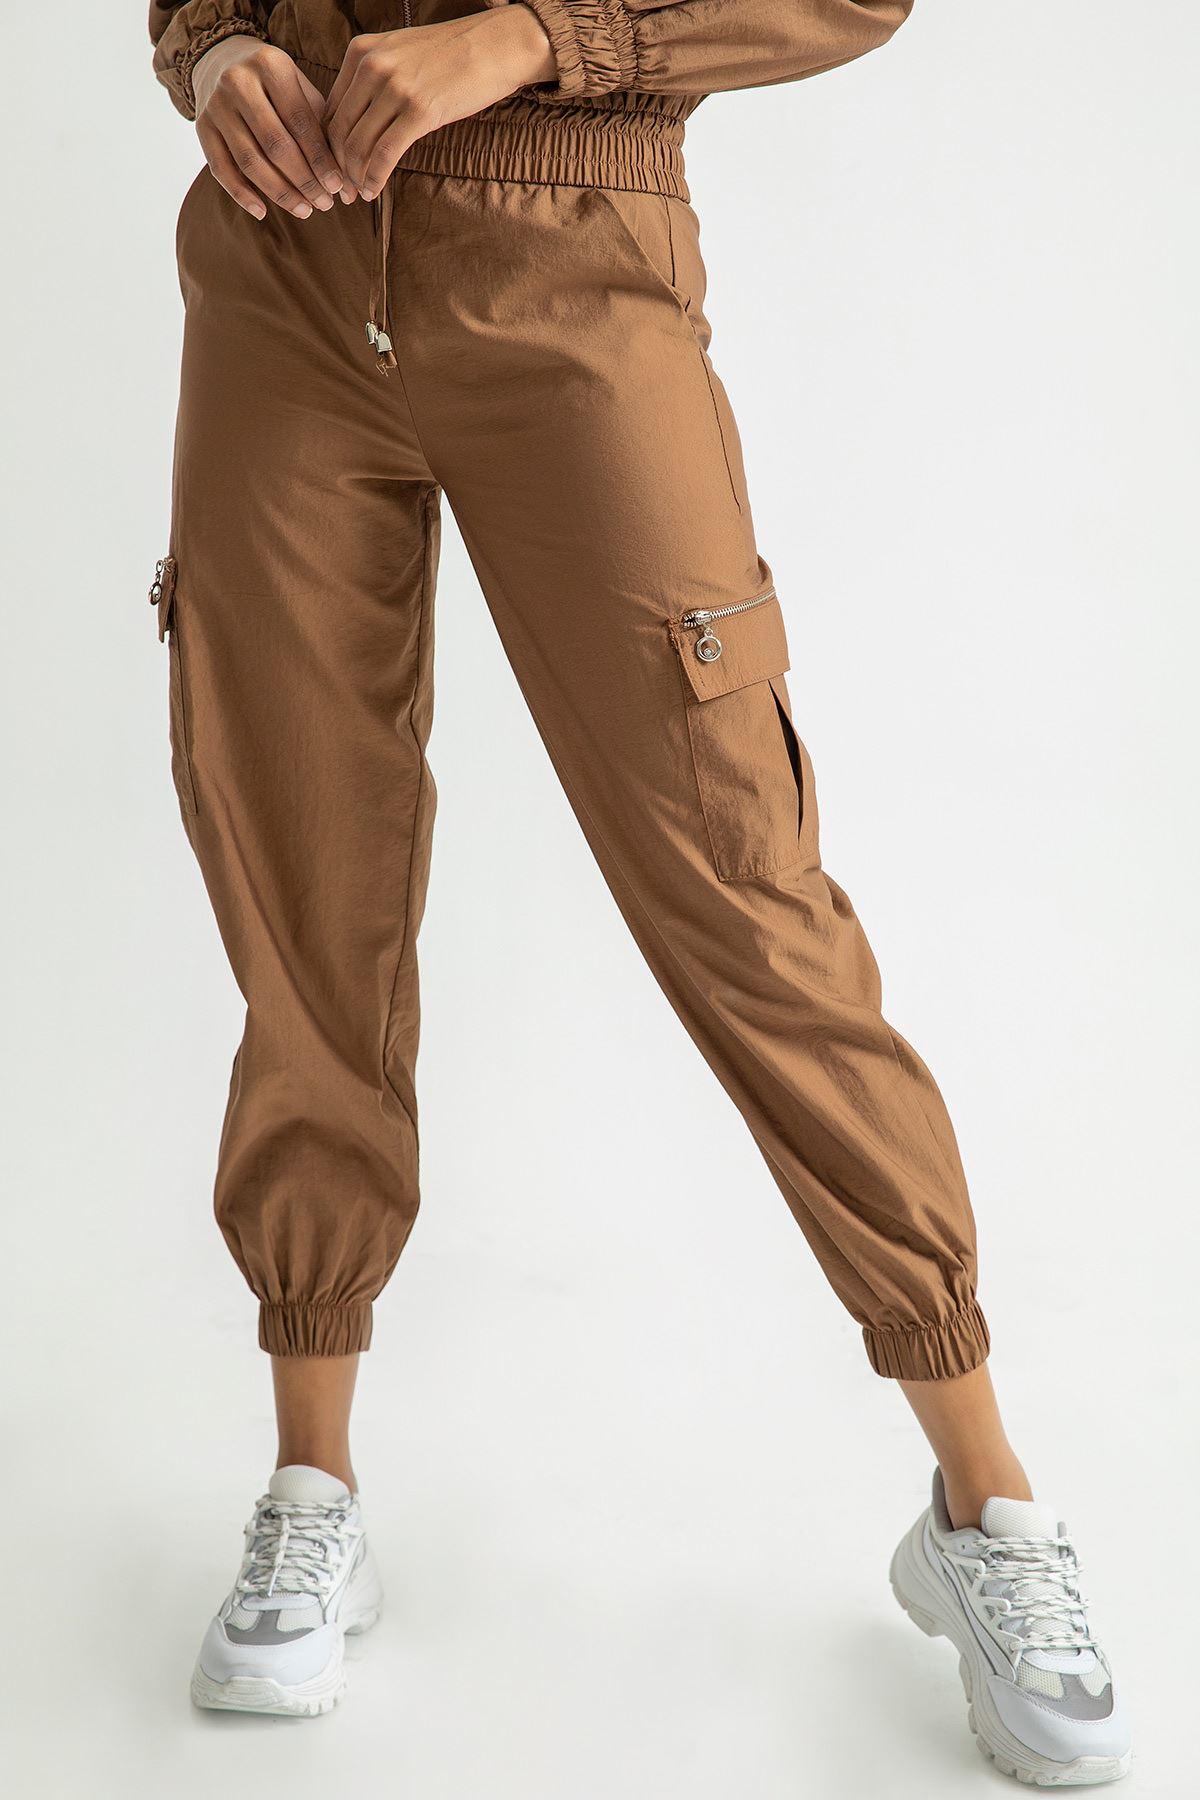 Beli Lastikli Kargo Pantolon-Tarçın